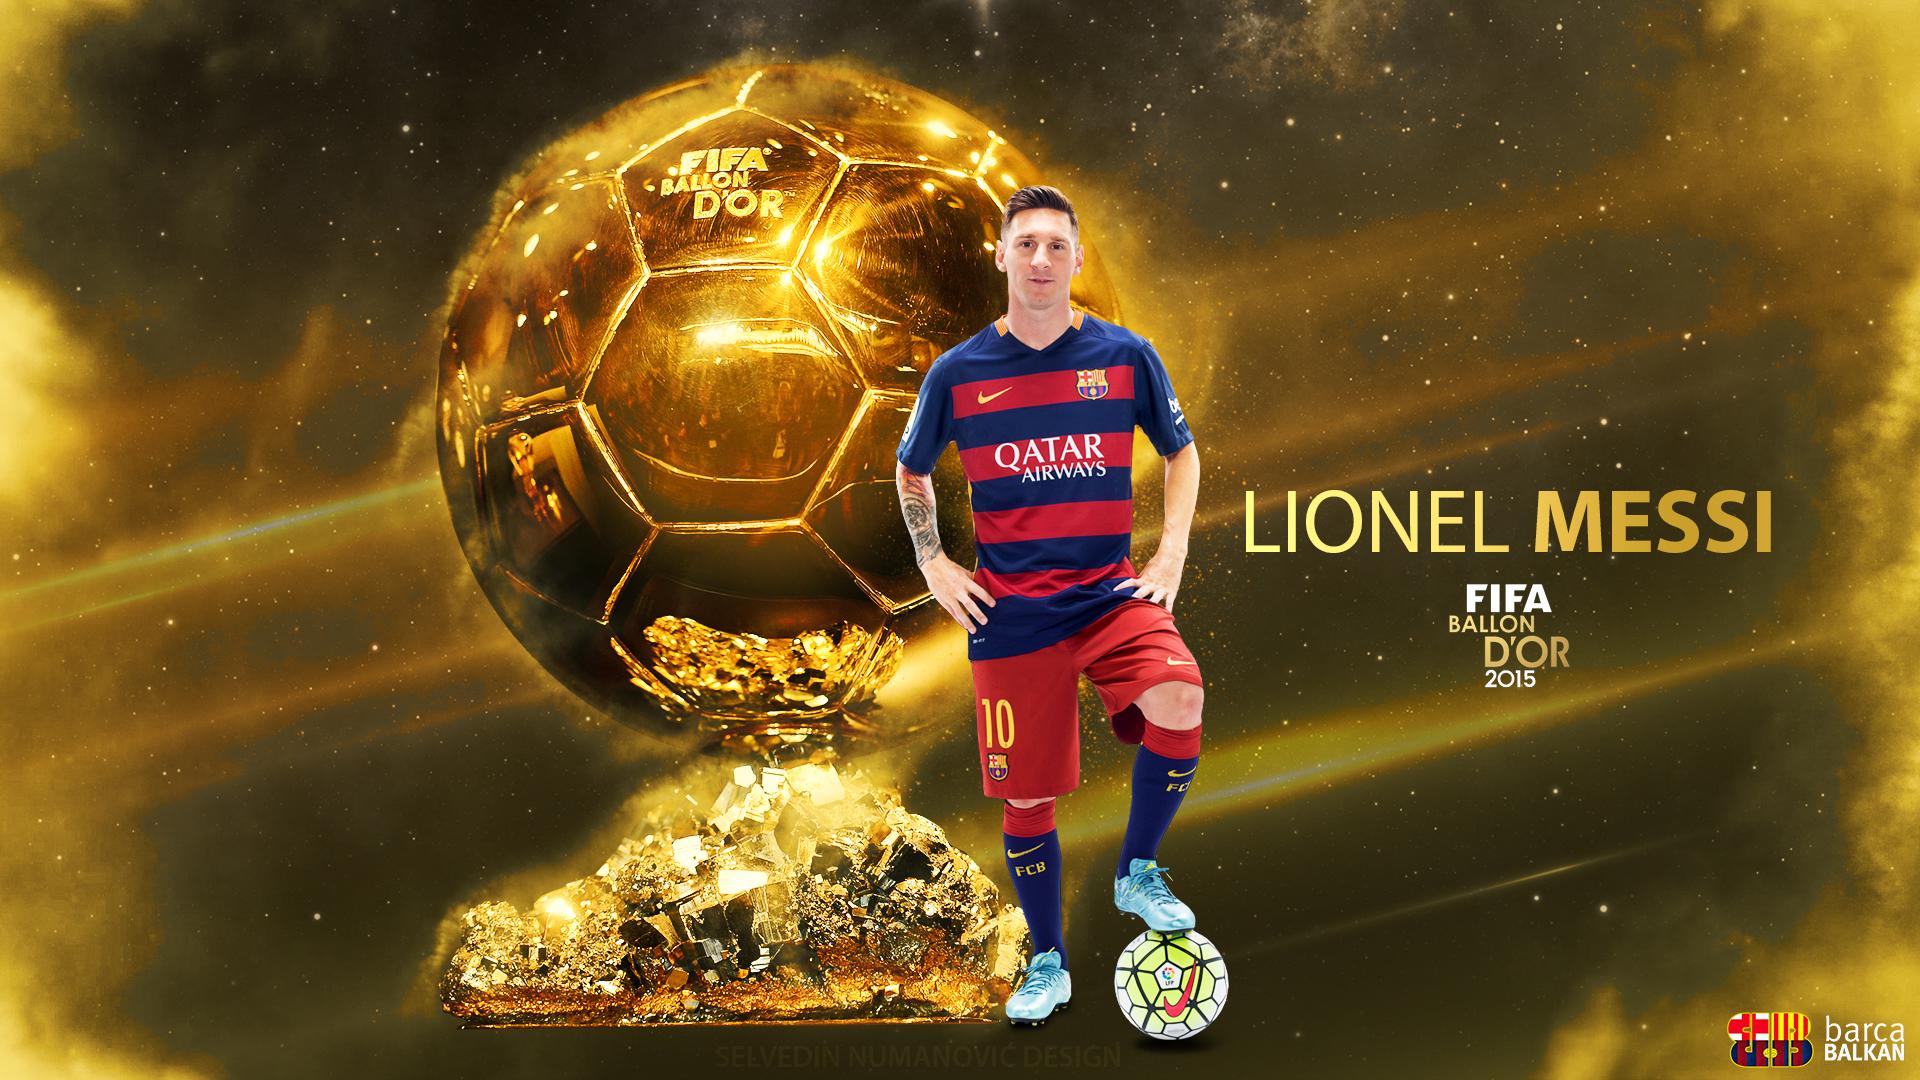 Lionel Messi FIFA Ballon D'Or 2015 HD Wallpaper By